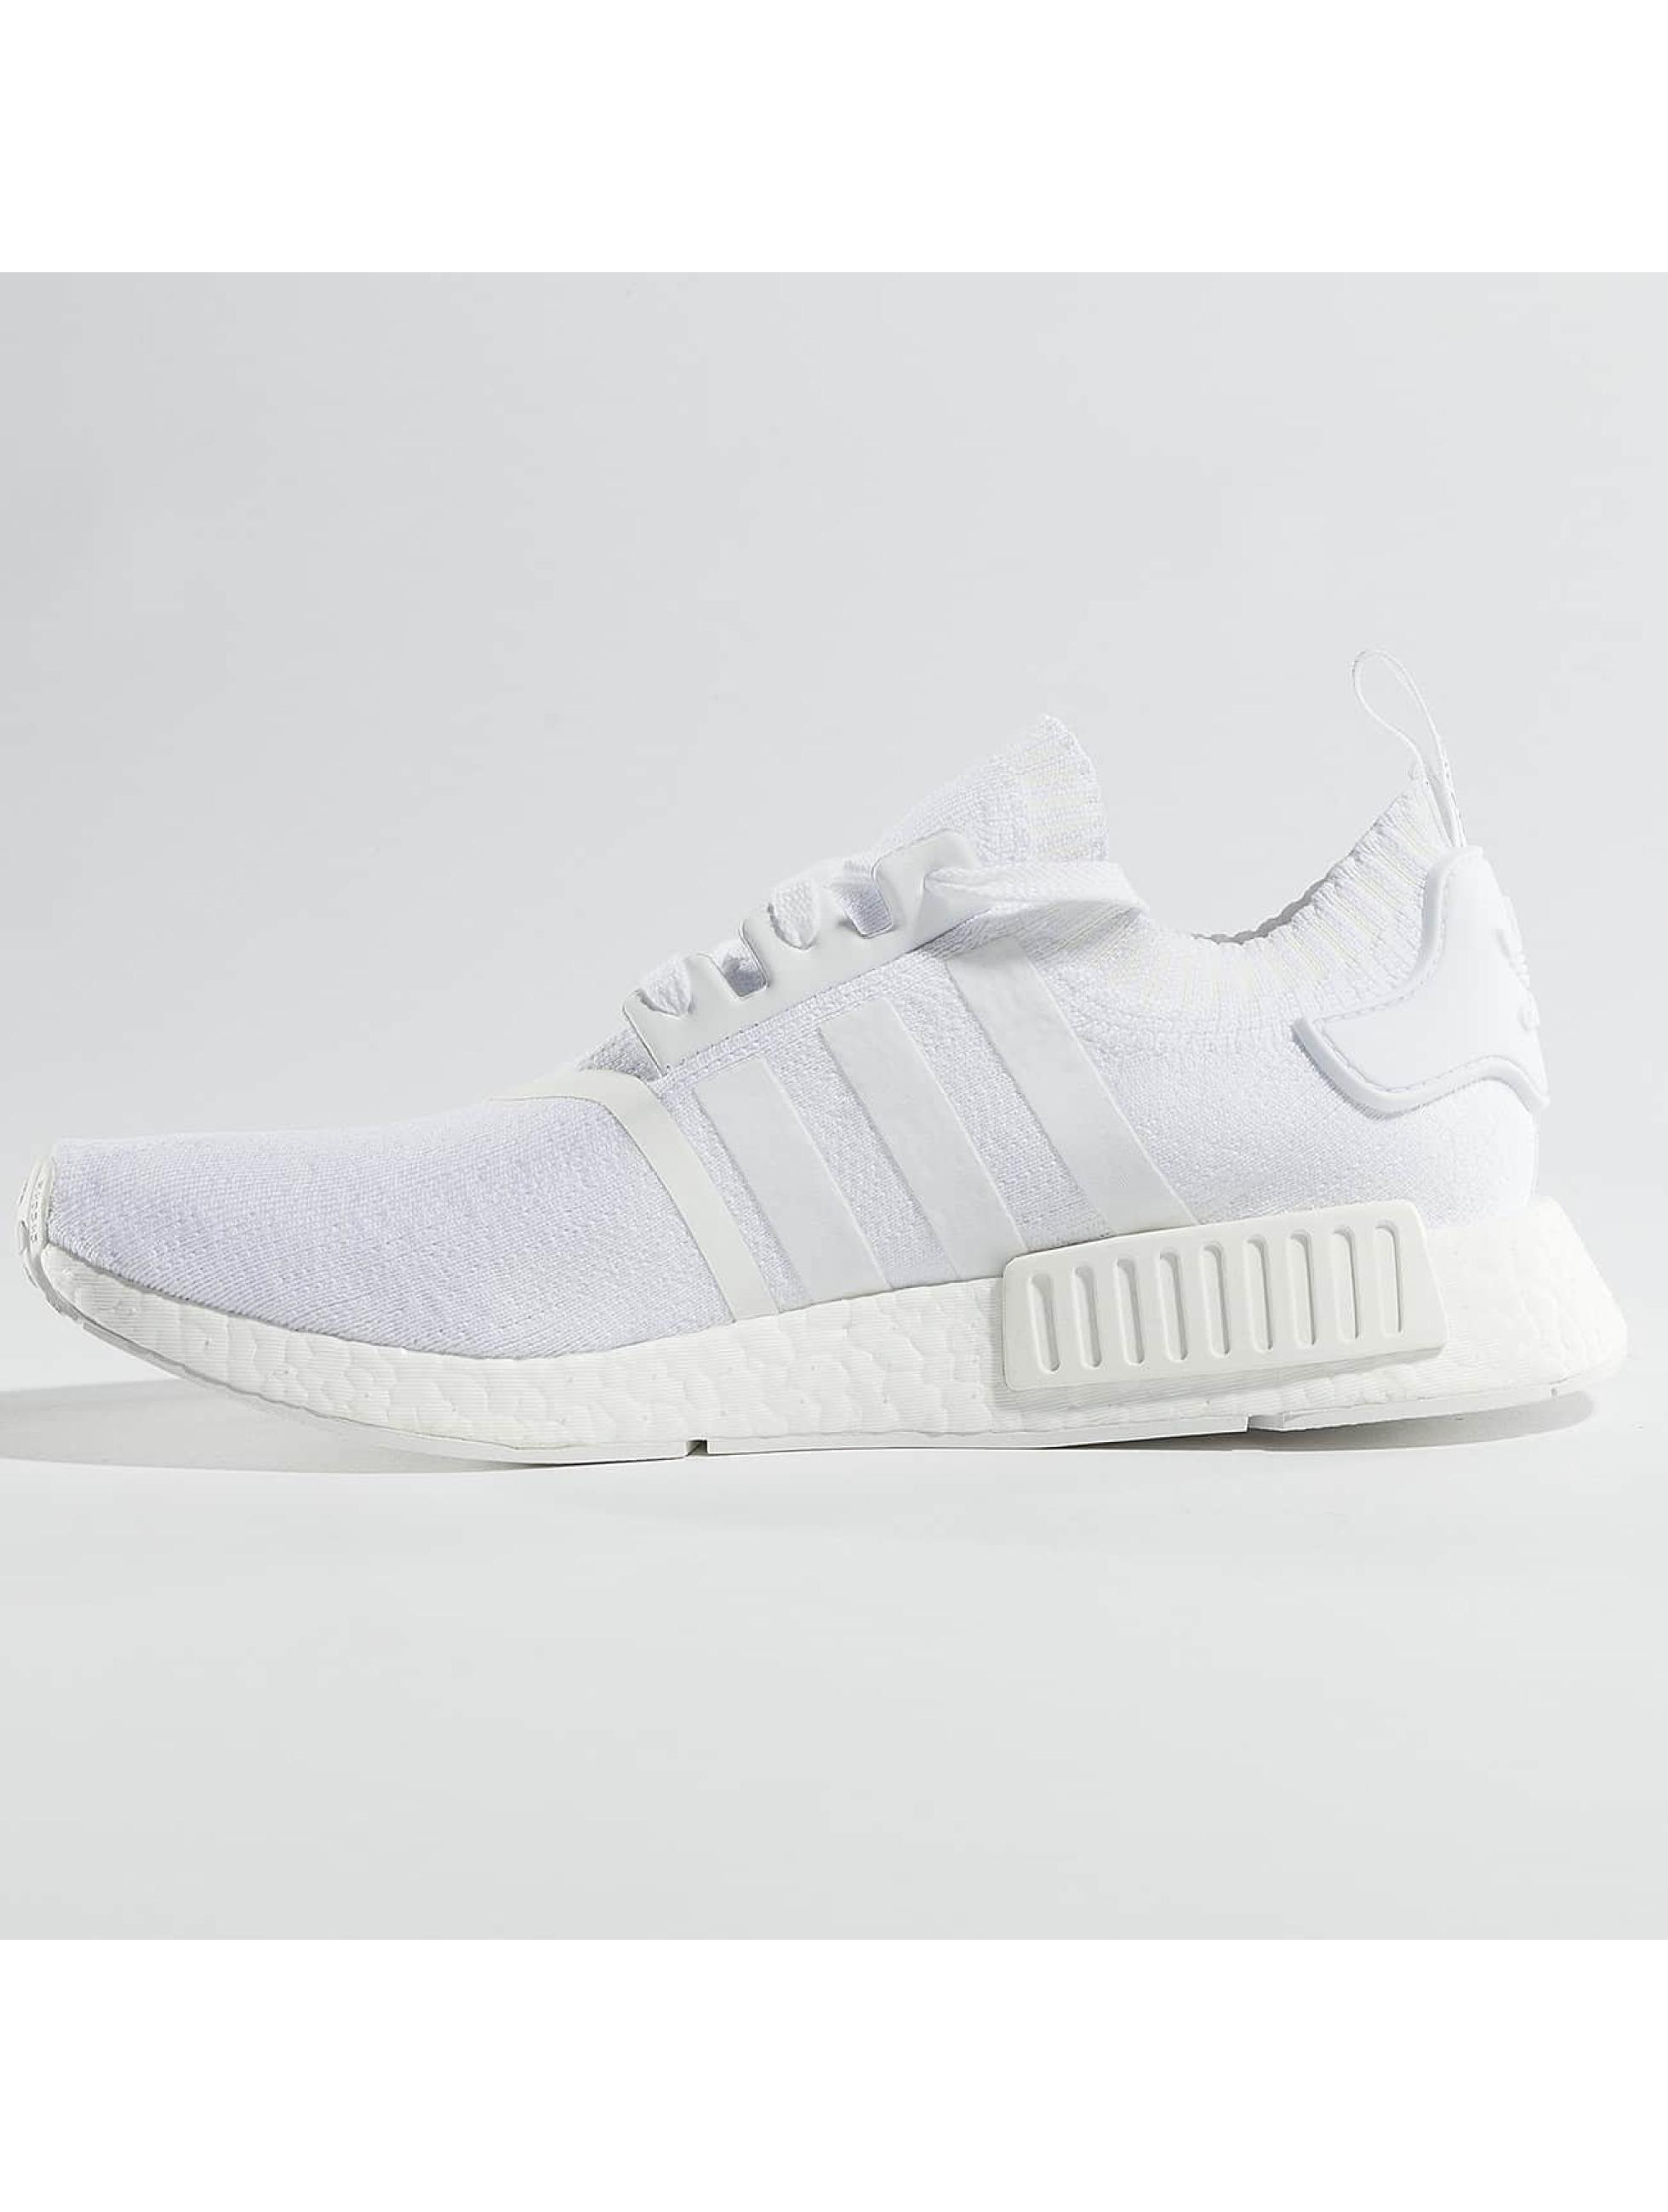 adidas originals Sneakers NMD_R1 PK white